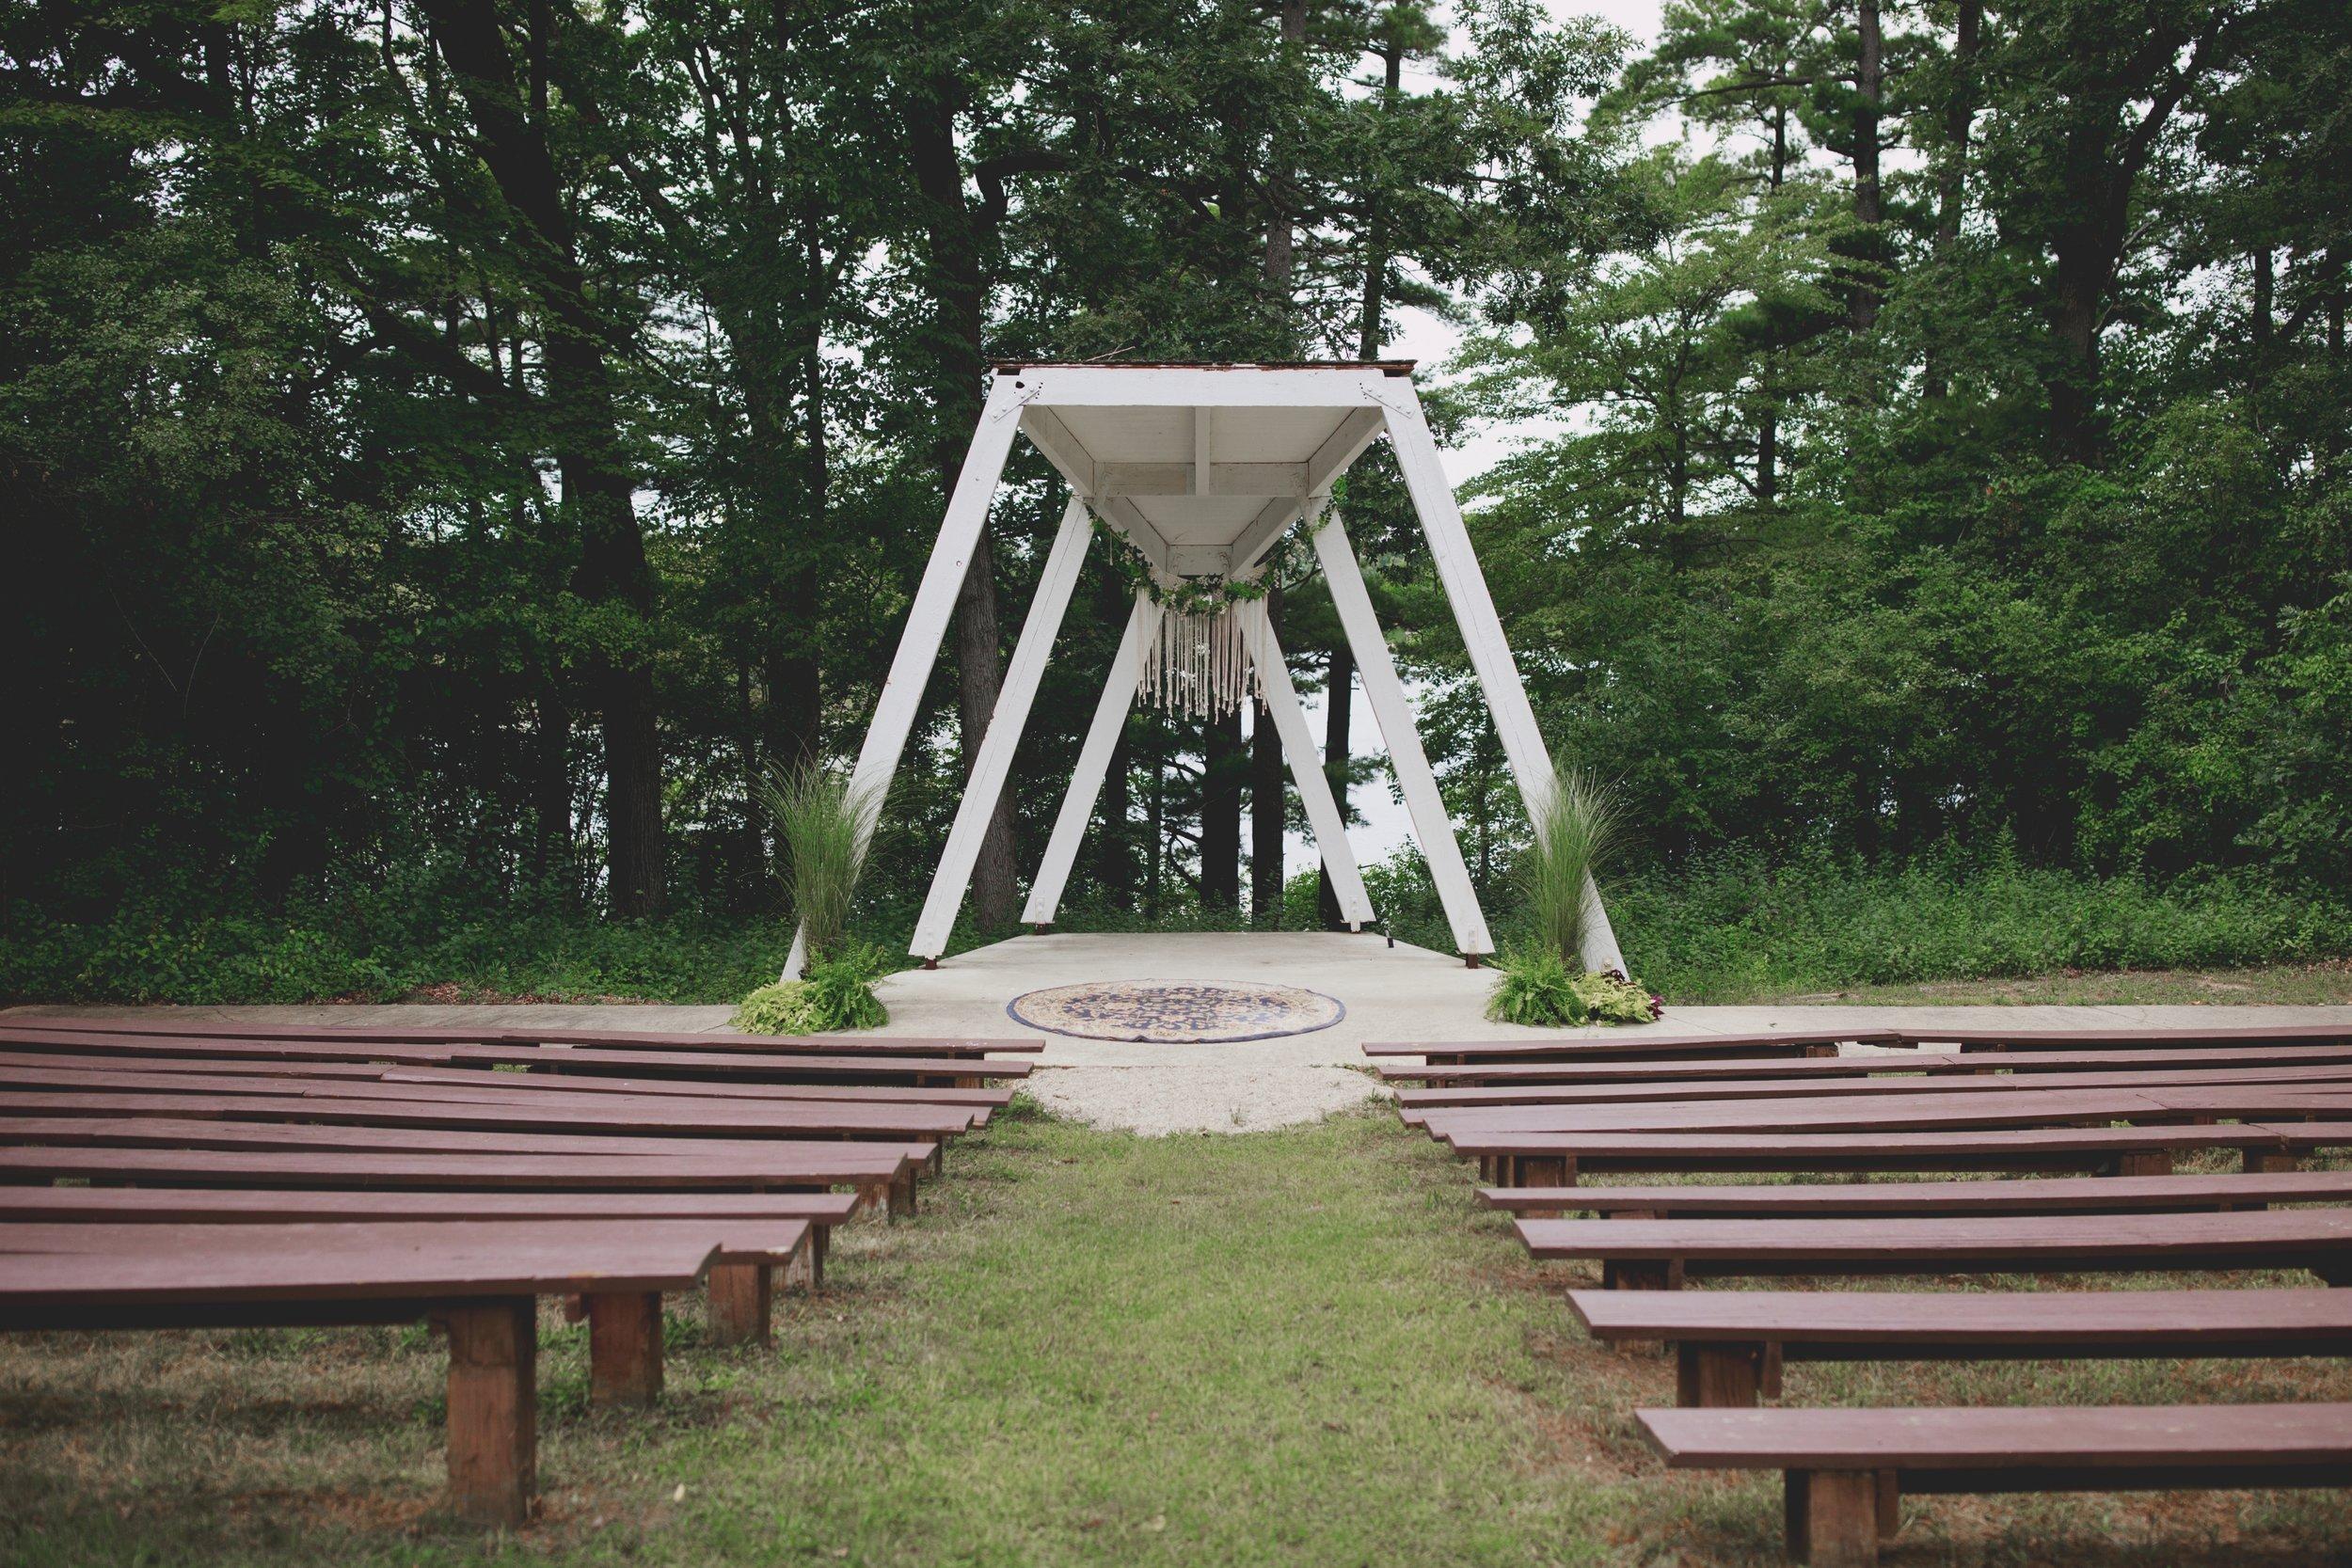 amanda_vanvels_michigan_camp_wedding_015.jpg